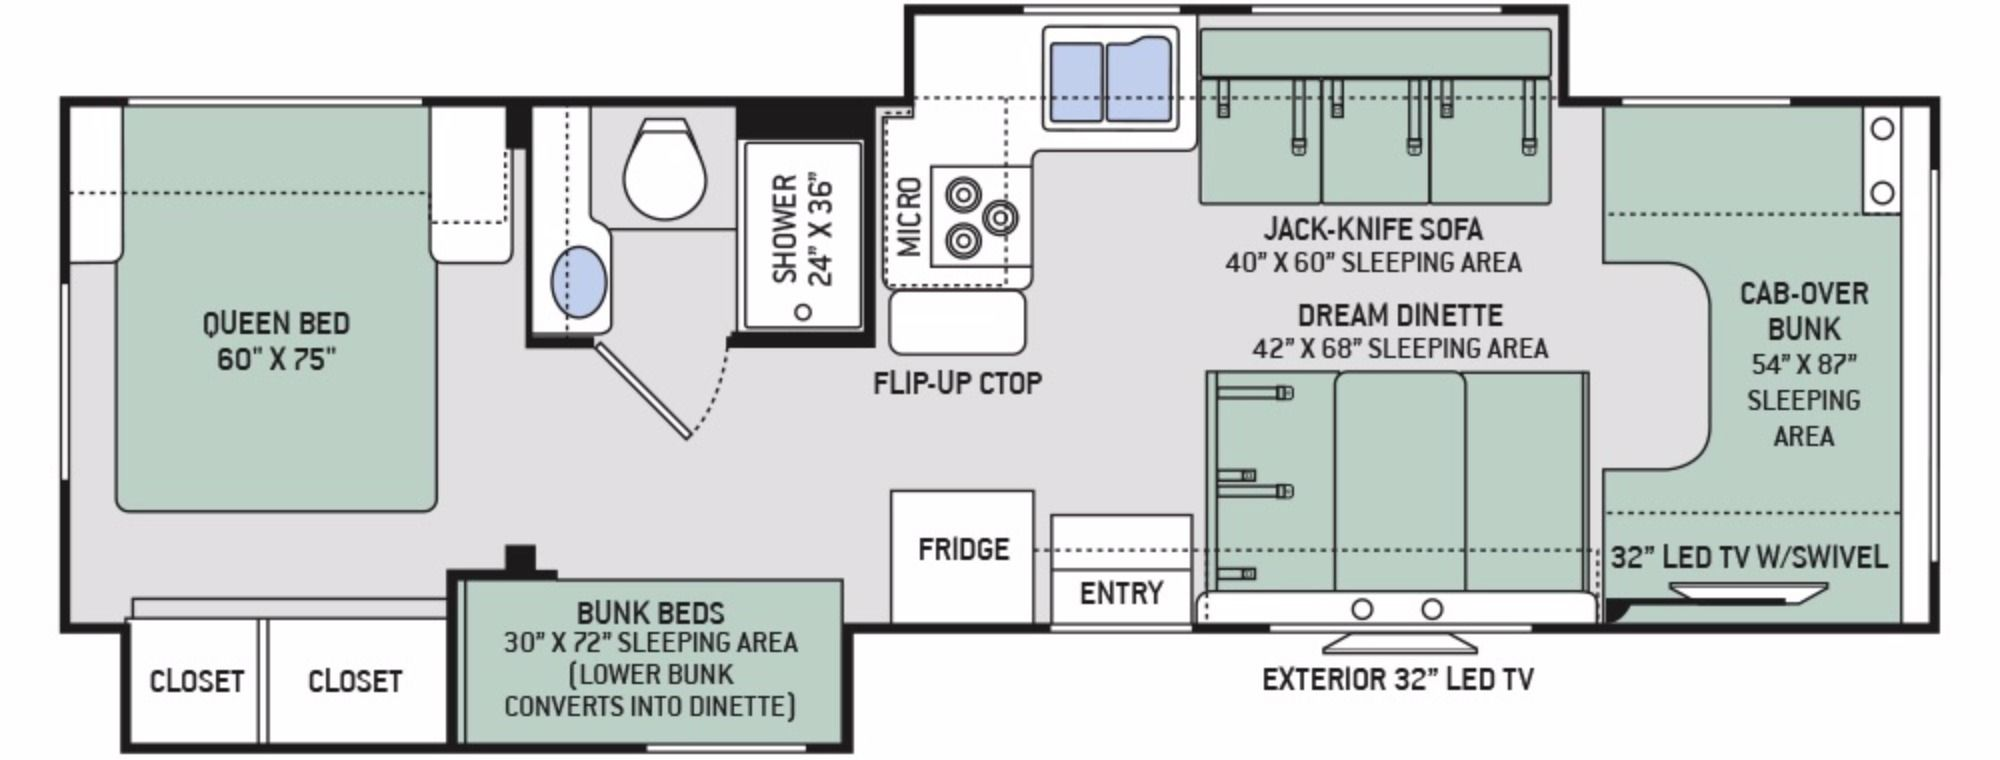 2017 Thor Freedom Elite 30fe Stock 1331054 Floor Plan This Is Our Dream Camper Rv Floor Plans Floor Plans Camper Flooring